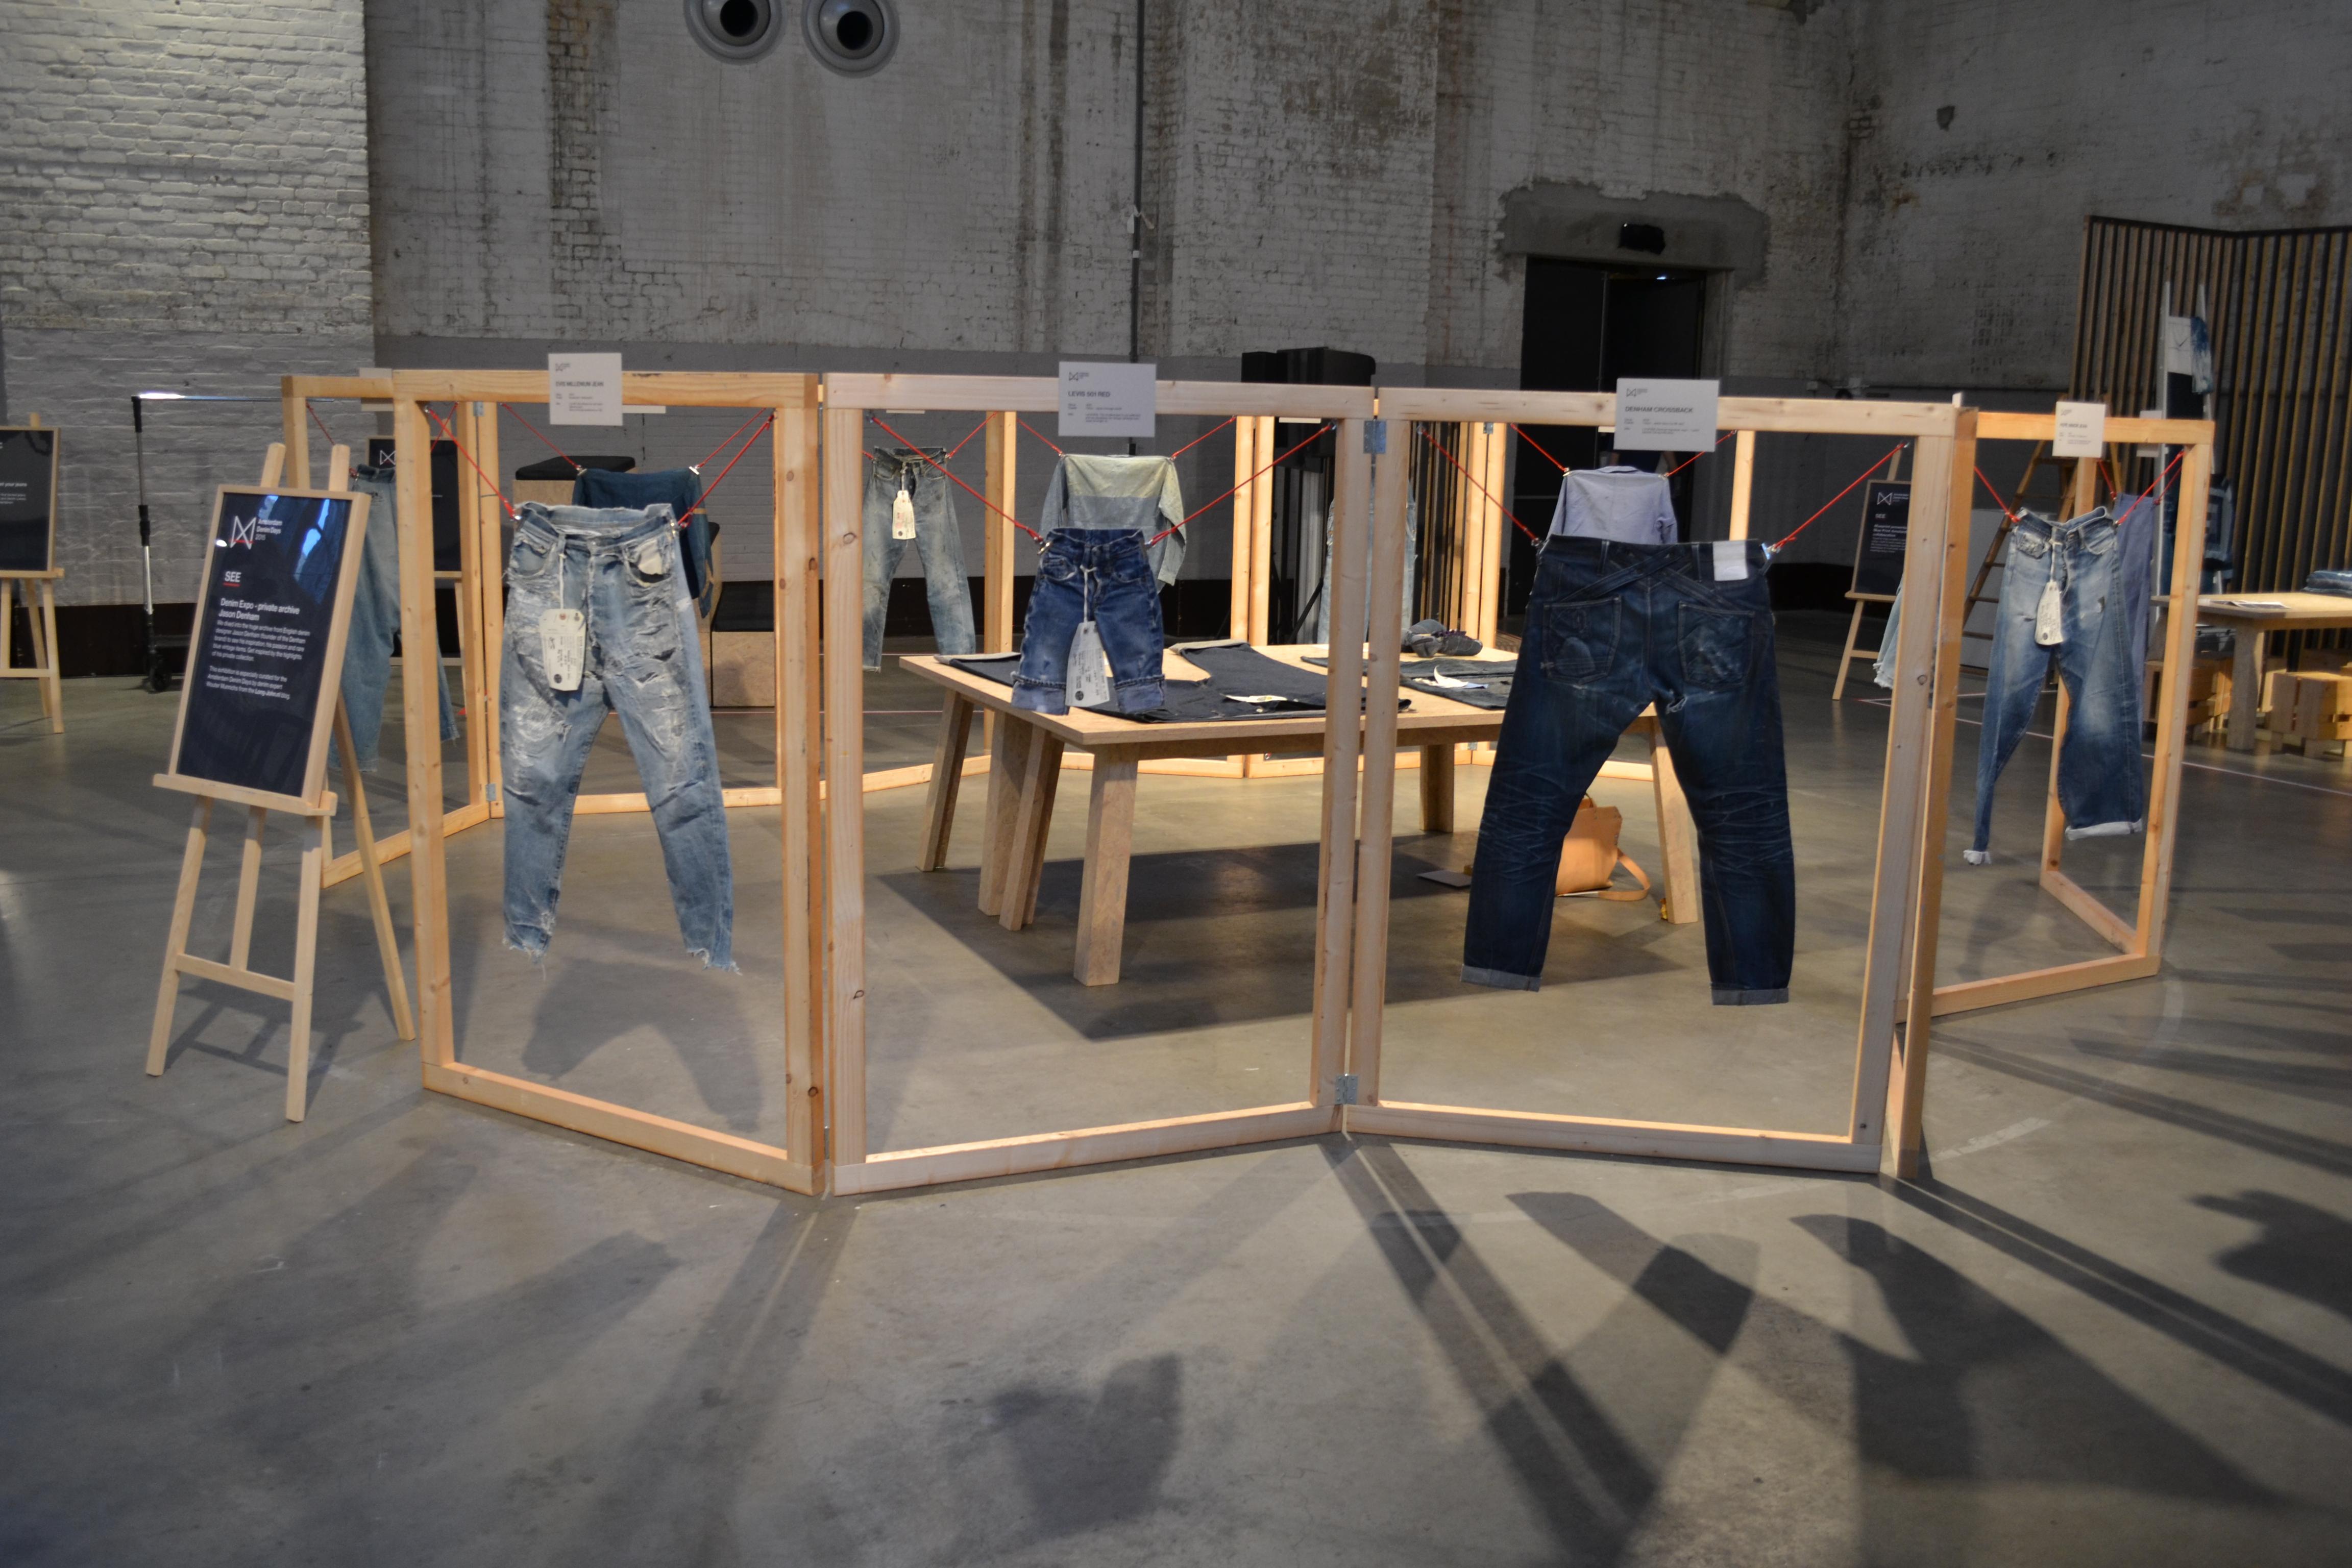 amsterdam denim days long john blog denham jason expo curated by wouter munnichs jeans denim workwear evis evisu levi's boro japan event gloves indigo pepe jeans minor big e (1)